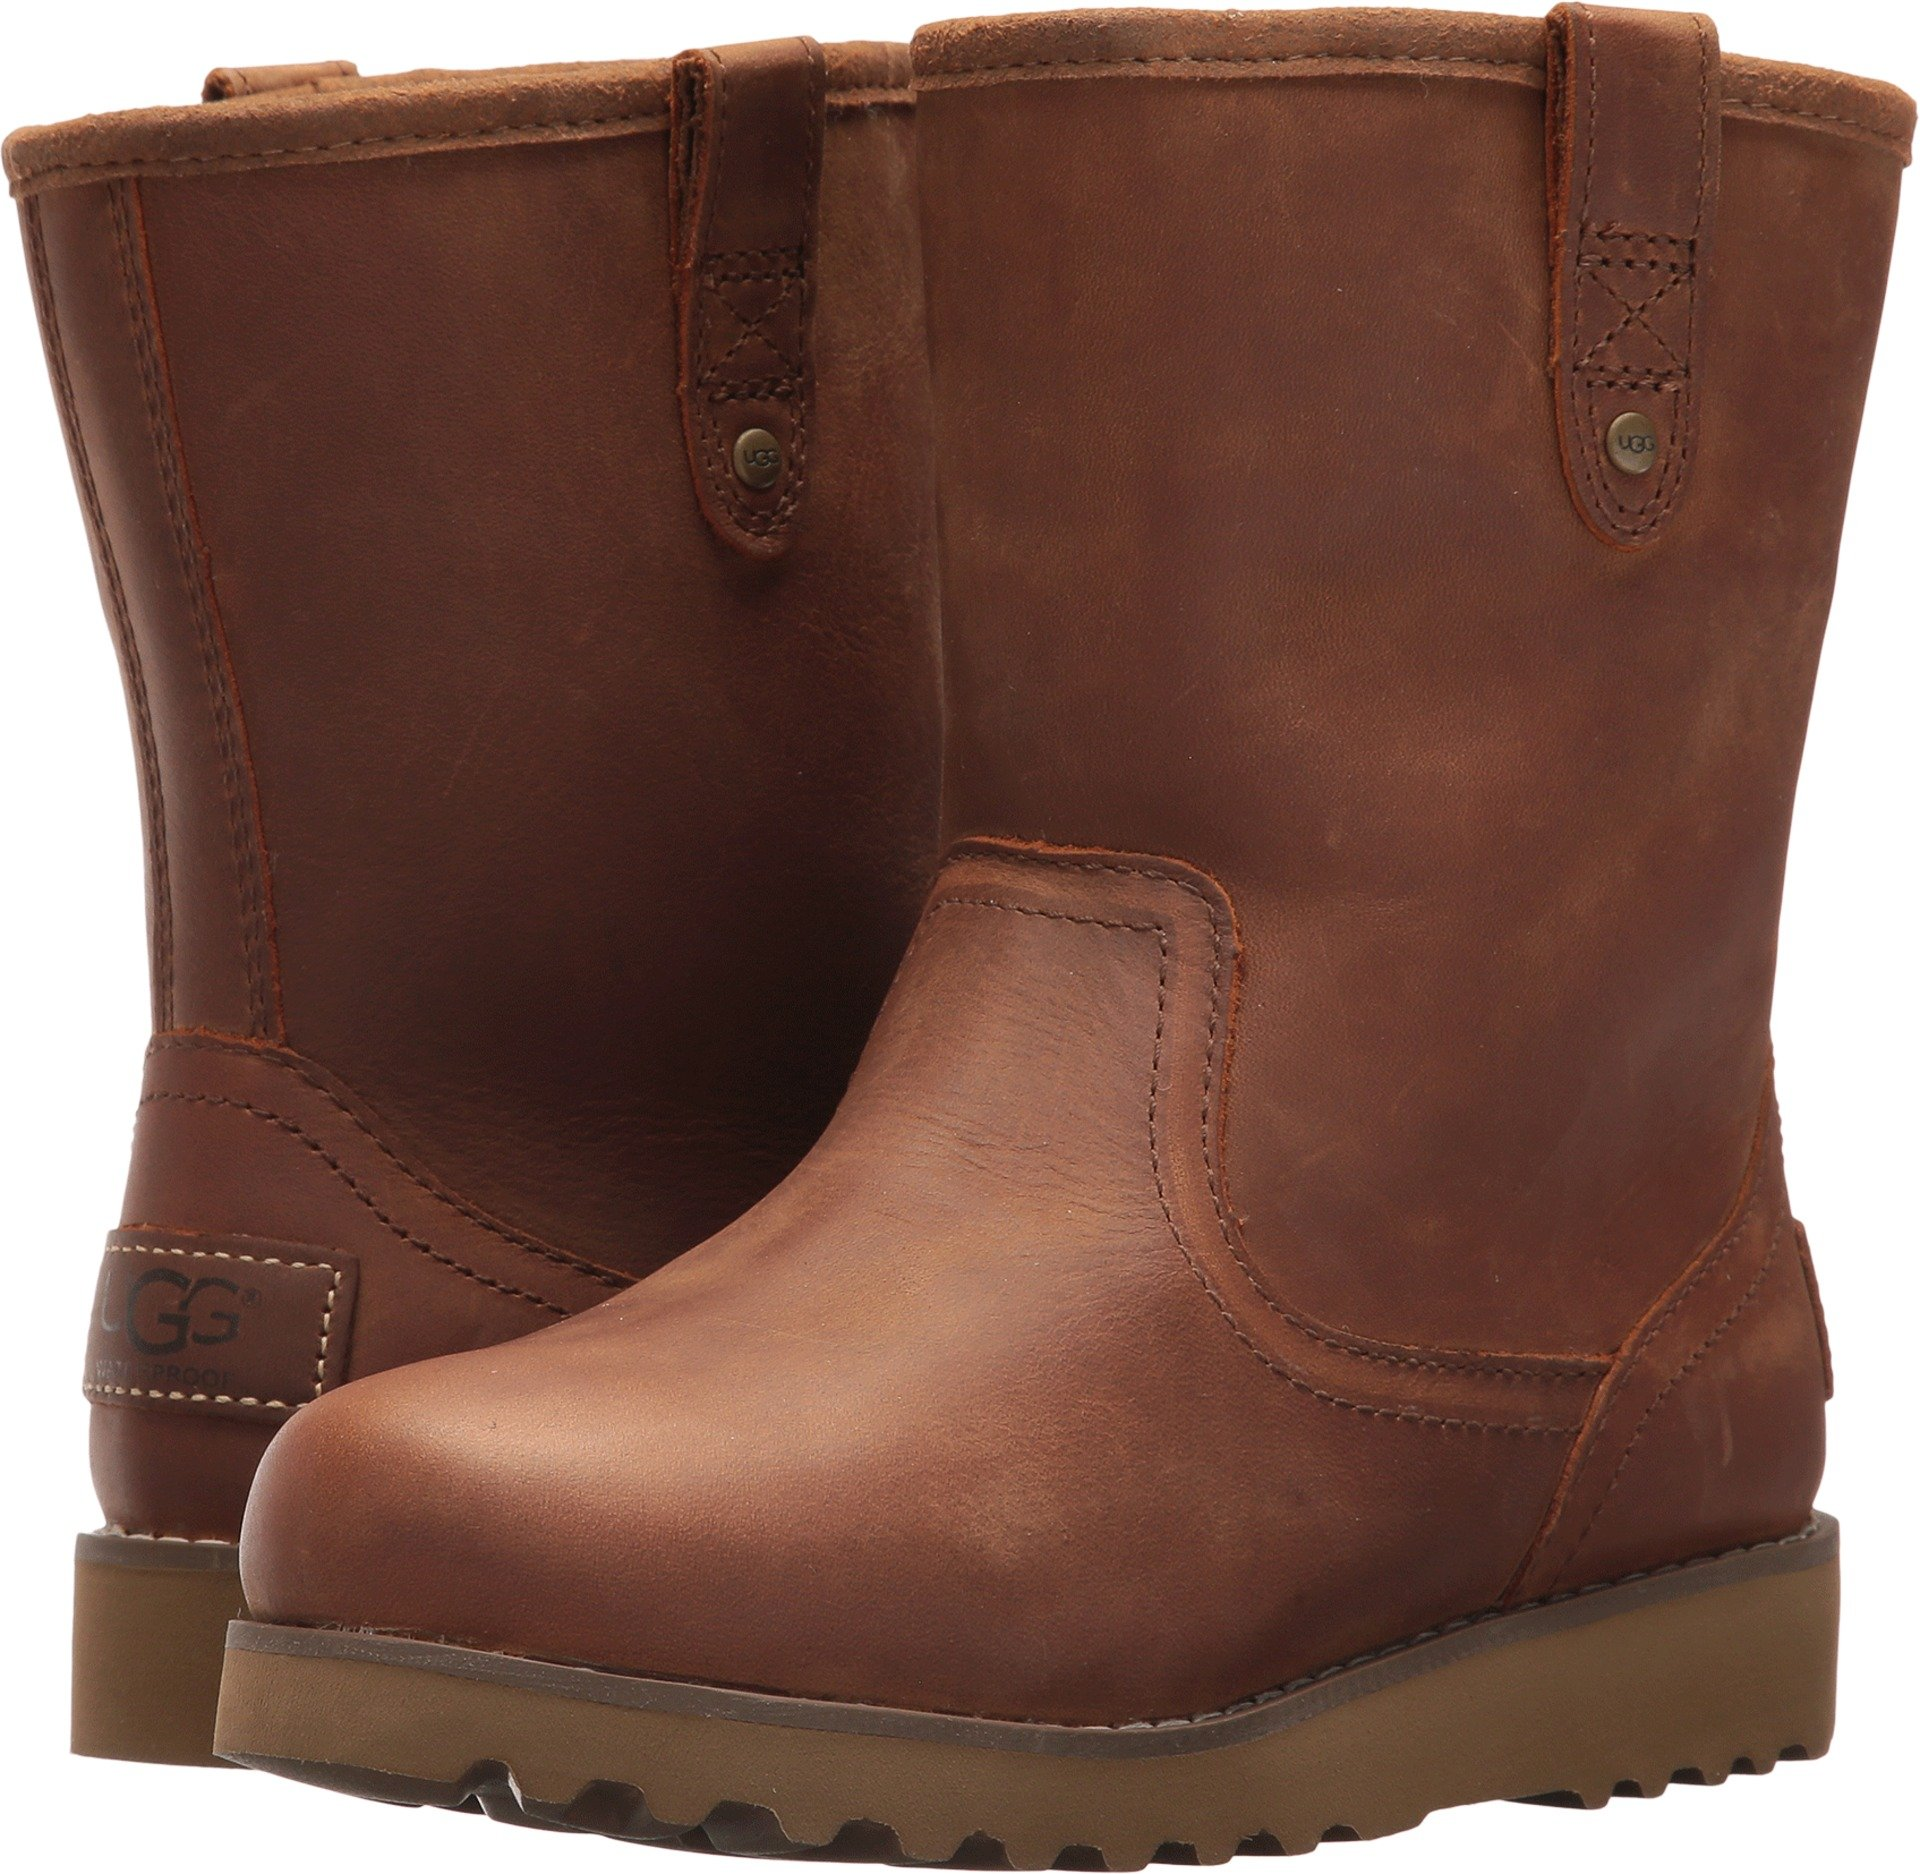 UGG Boys K Redwood II Pull-on Boot, Chestnut, 1 M US Little Kid